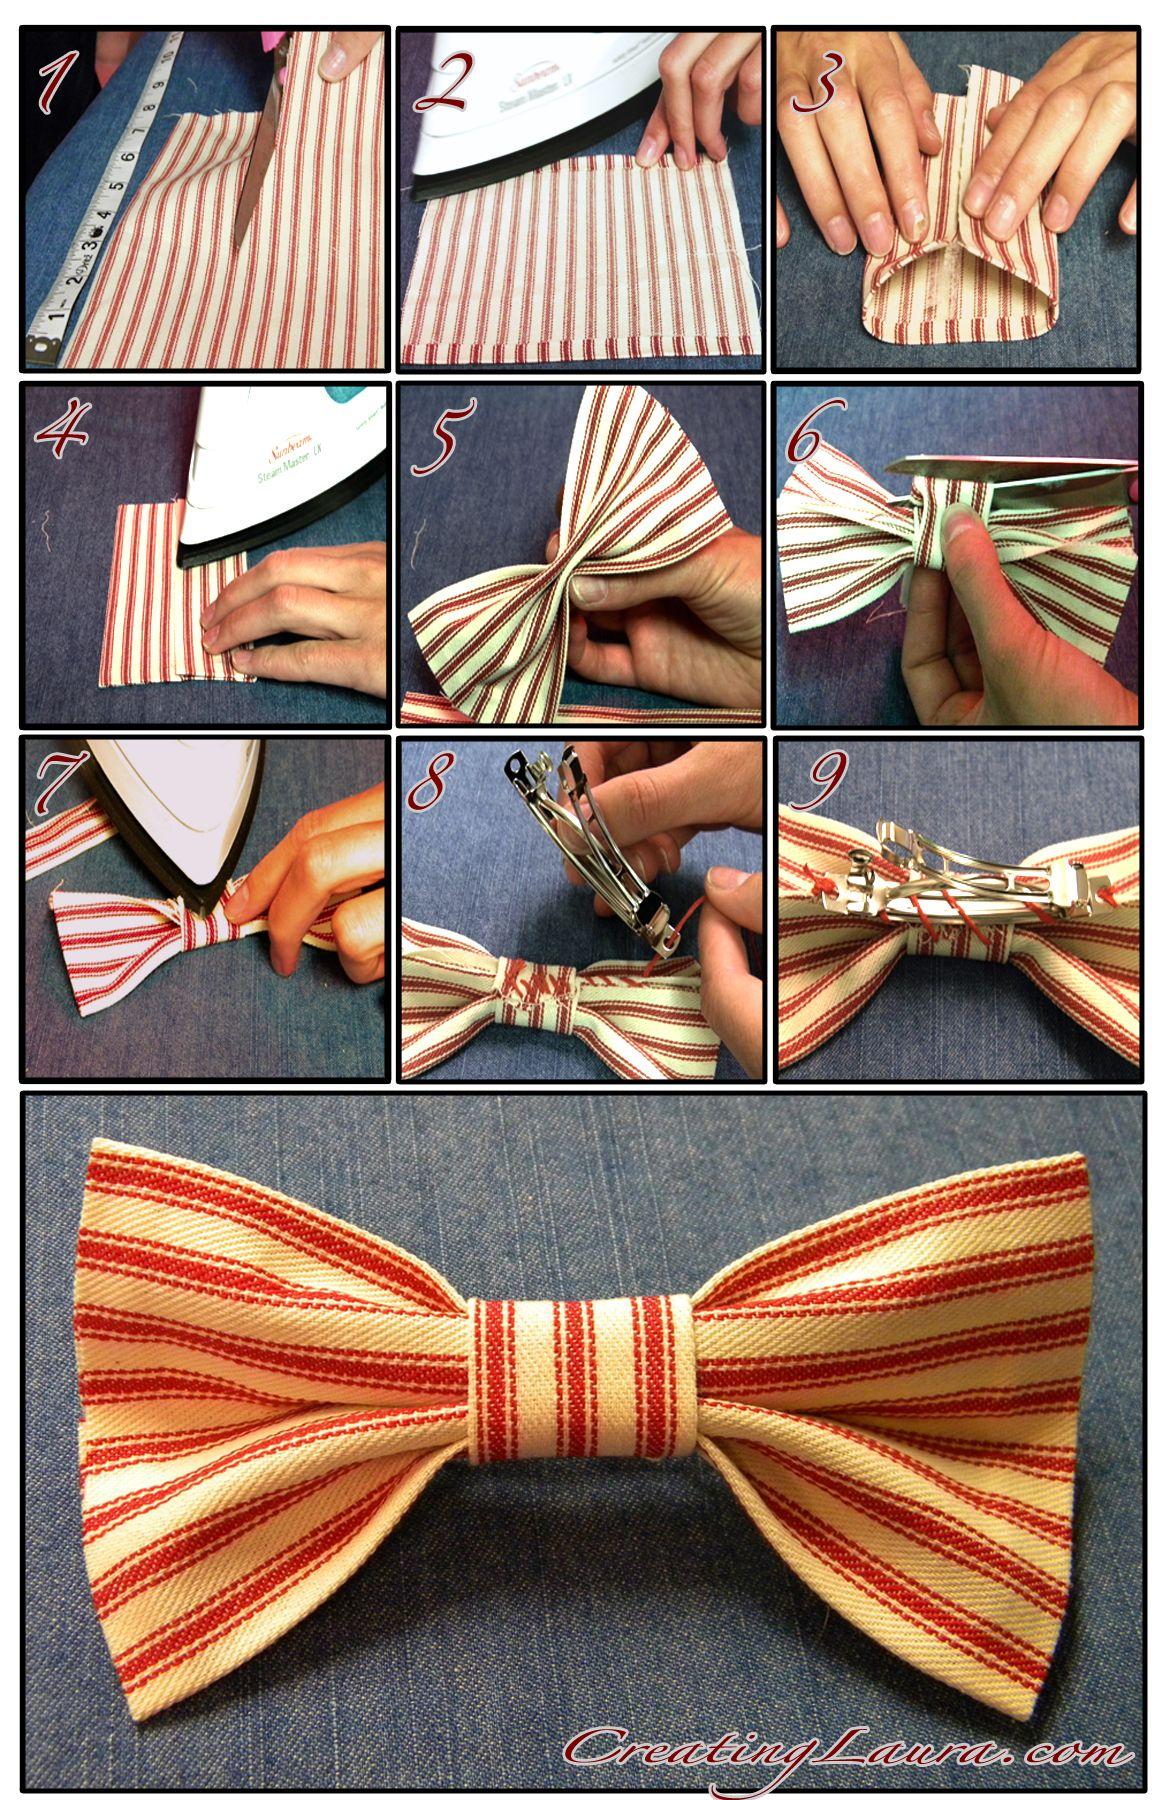 Creating laura hair bow happiness diy hair bows fabric